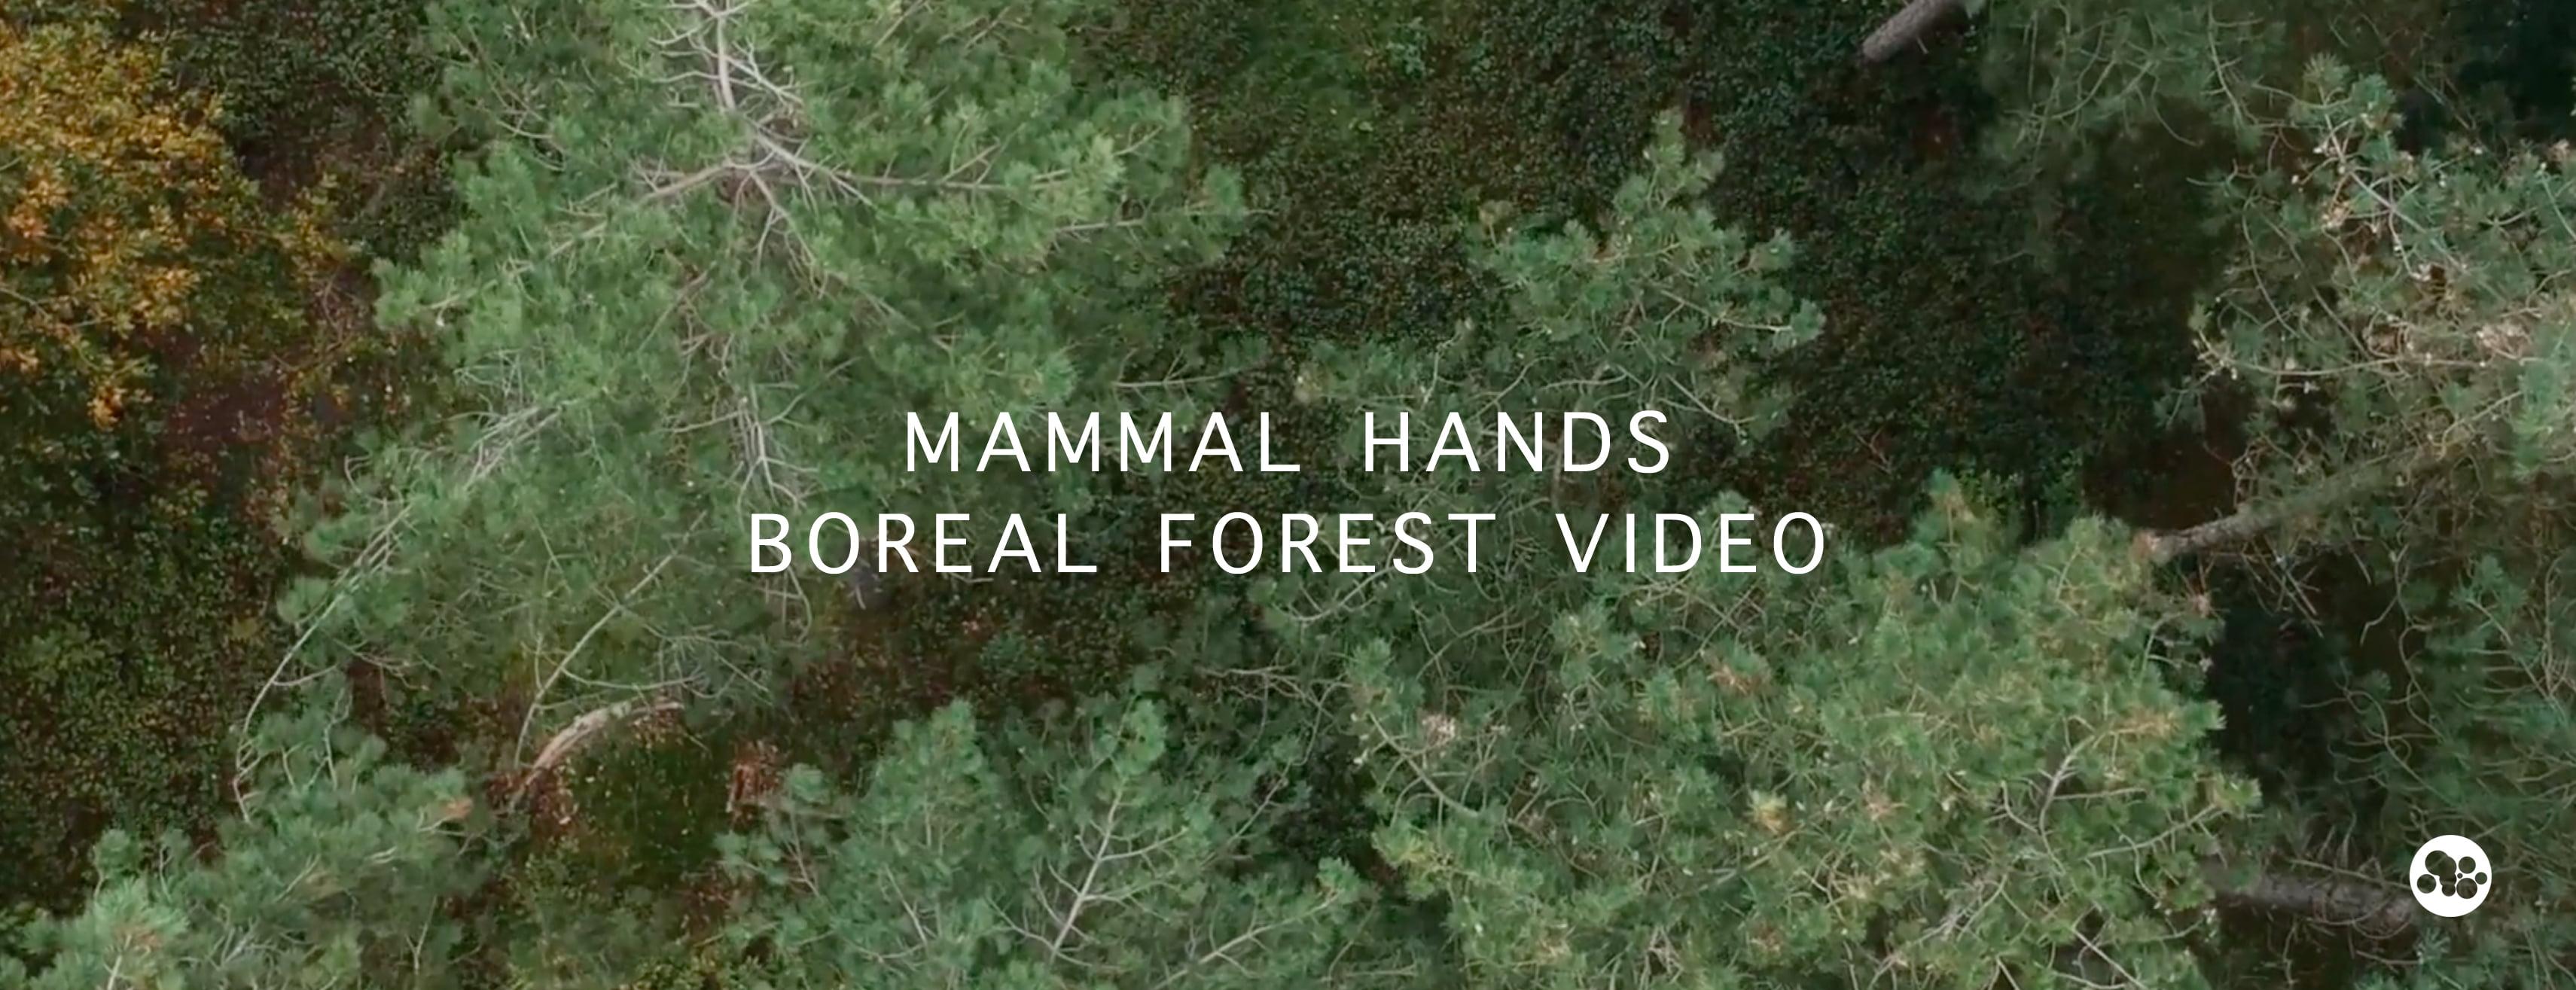 1. Mammal Hands Boreal Forest Facebook Banner